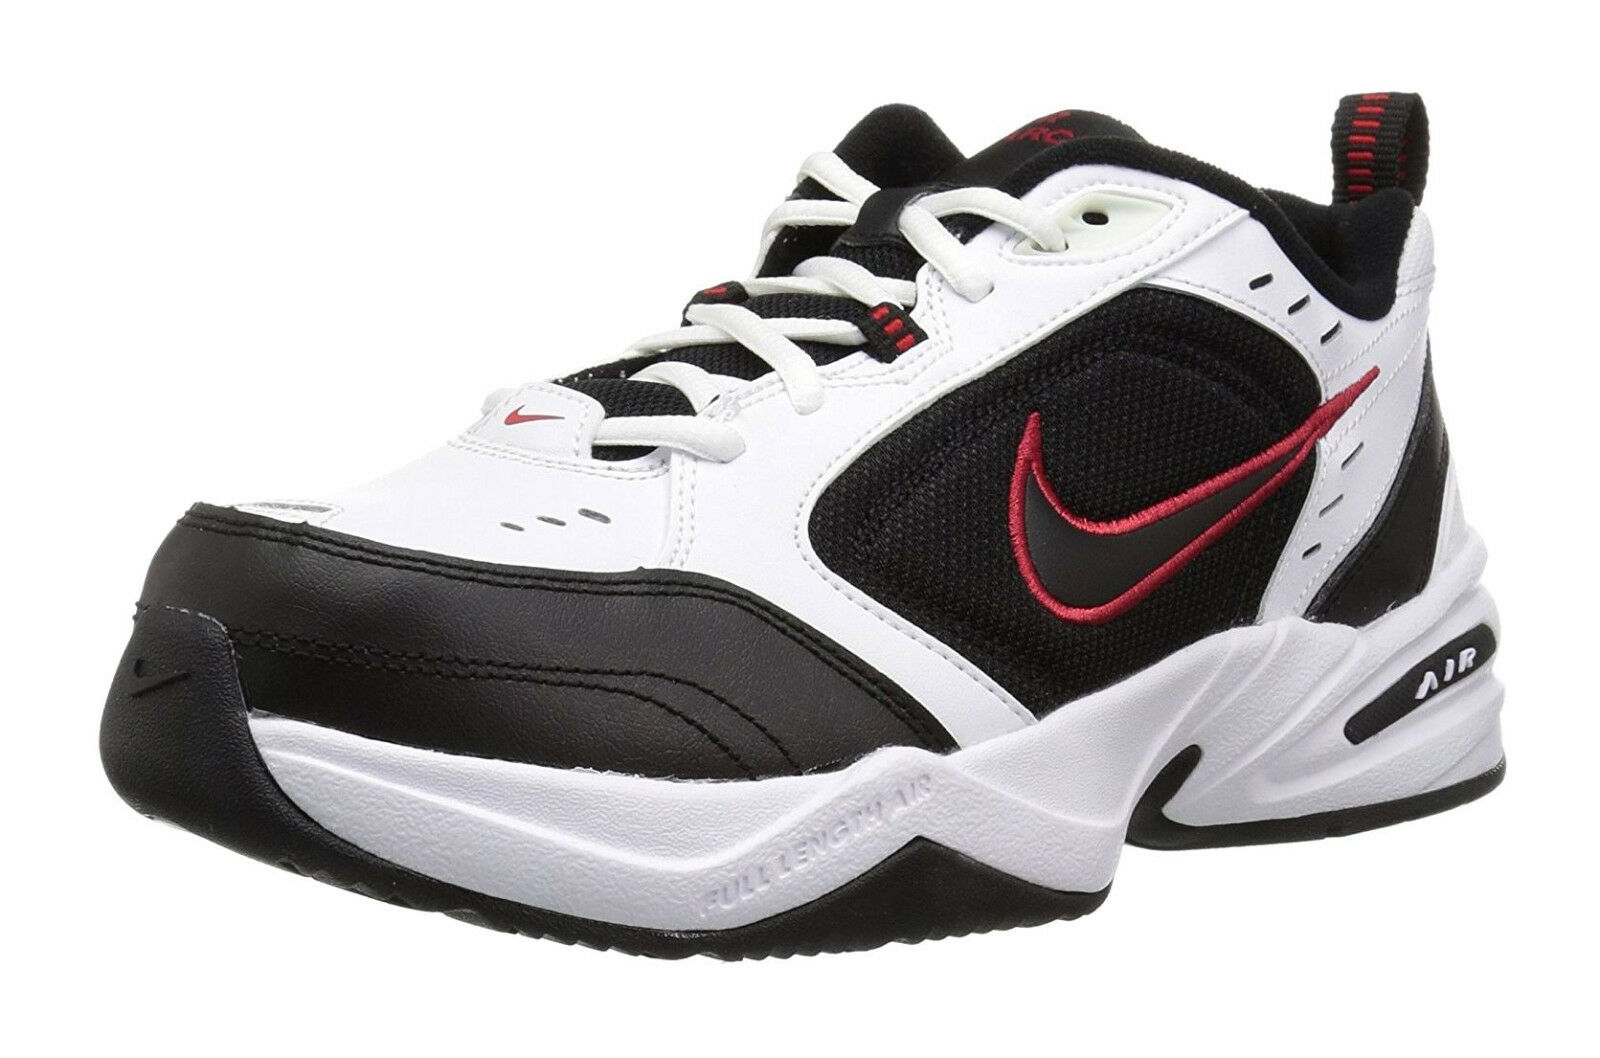 Nike Air Monarch IV Black, White Mens Training Sneakers Tennis Shoes 415445 101